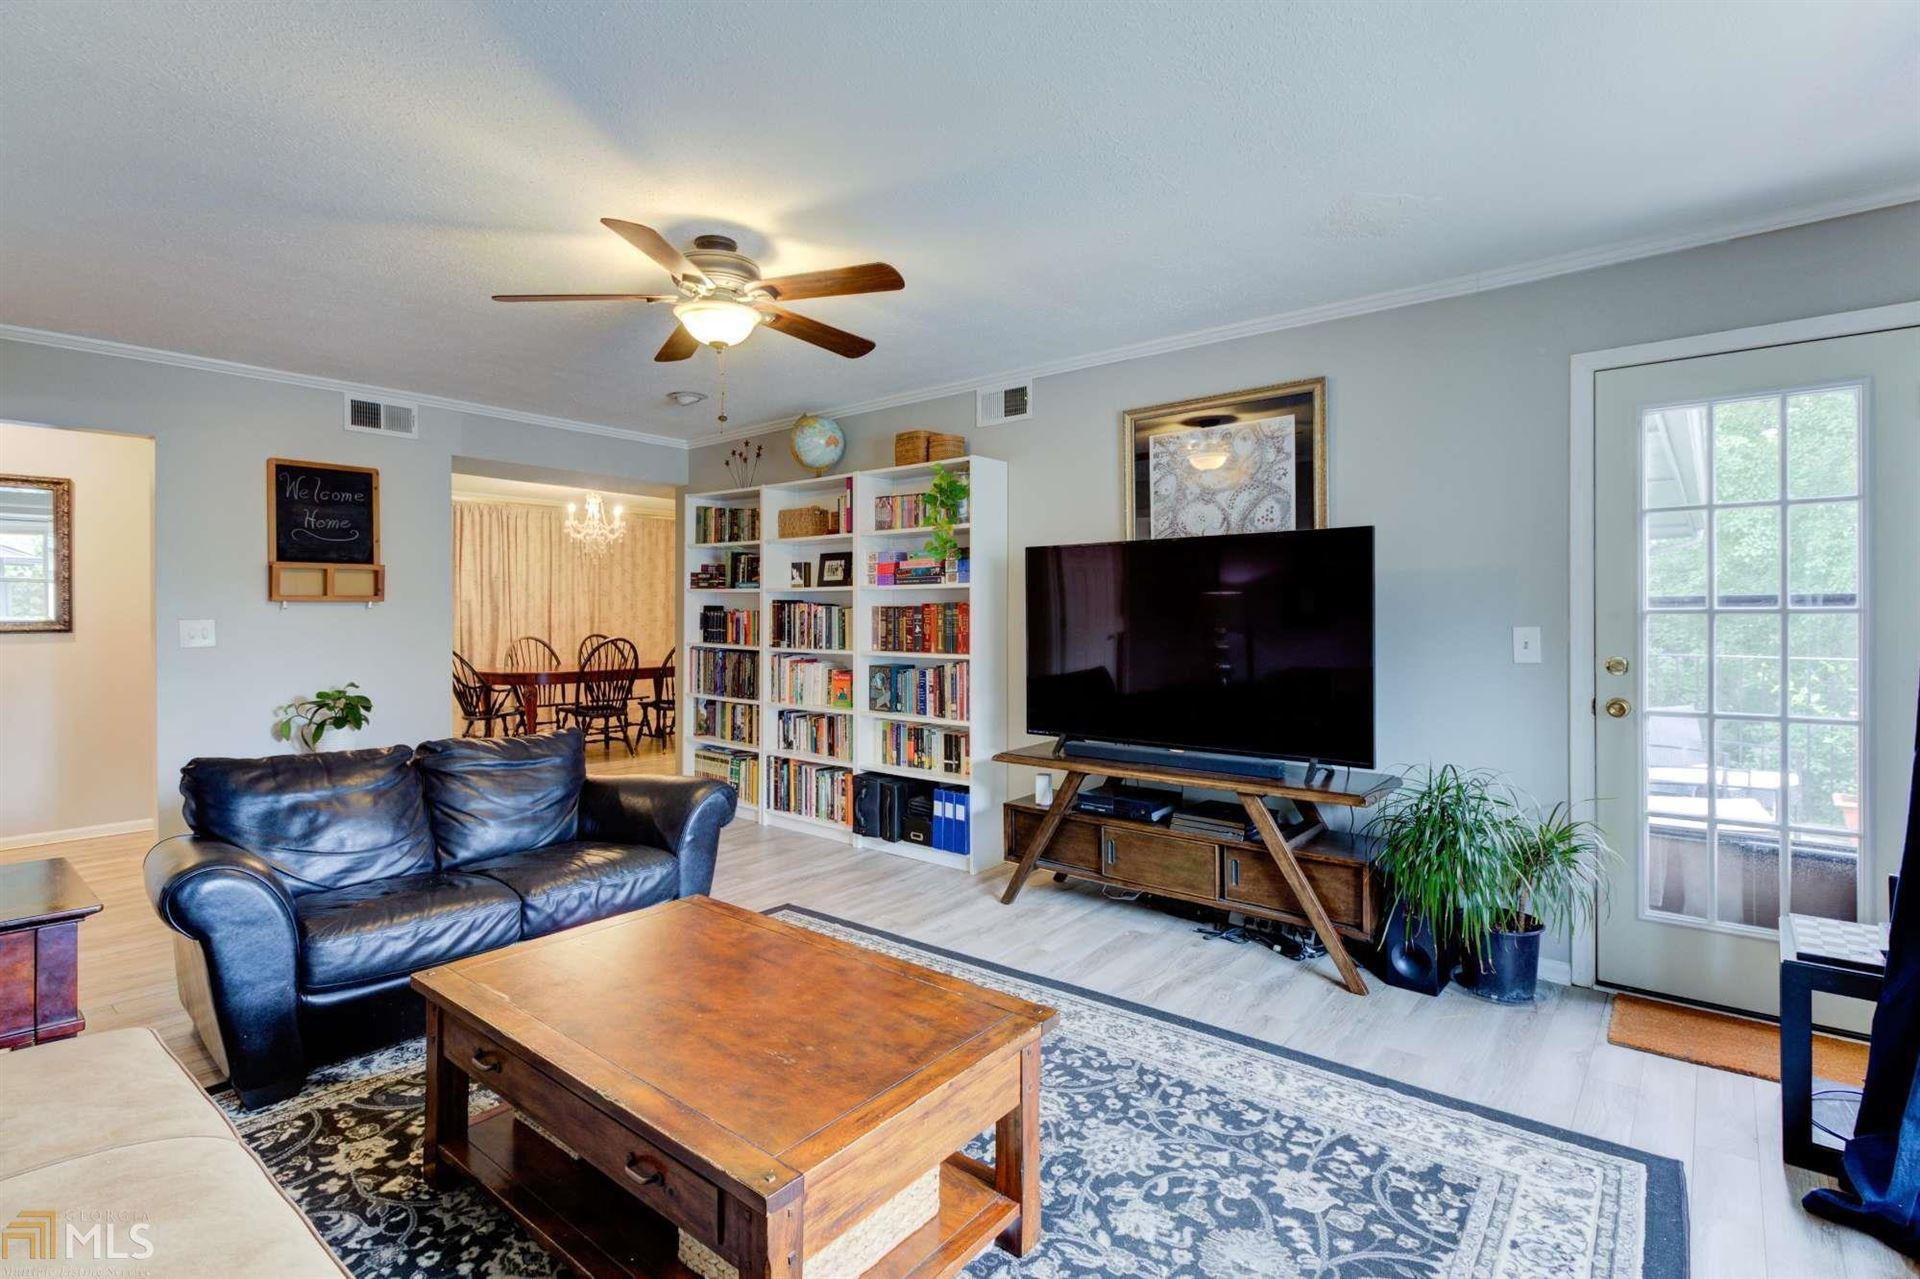 6851 Roswell Rd, Sandy Springs, GA 30328 - MLS#: 8846767